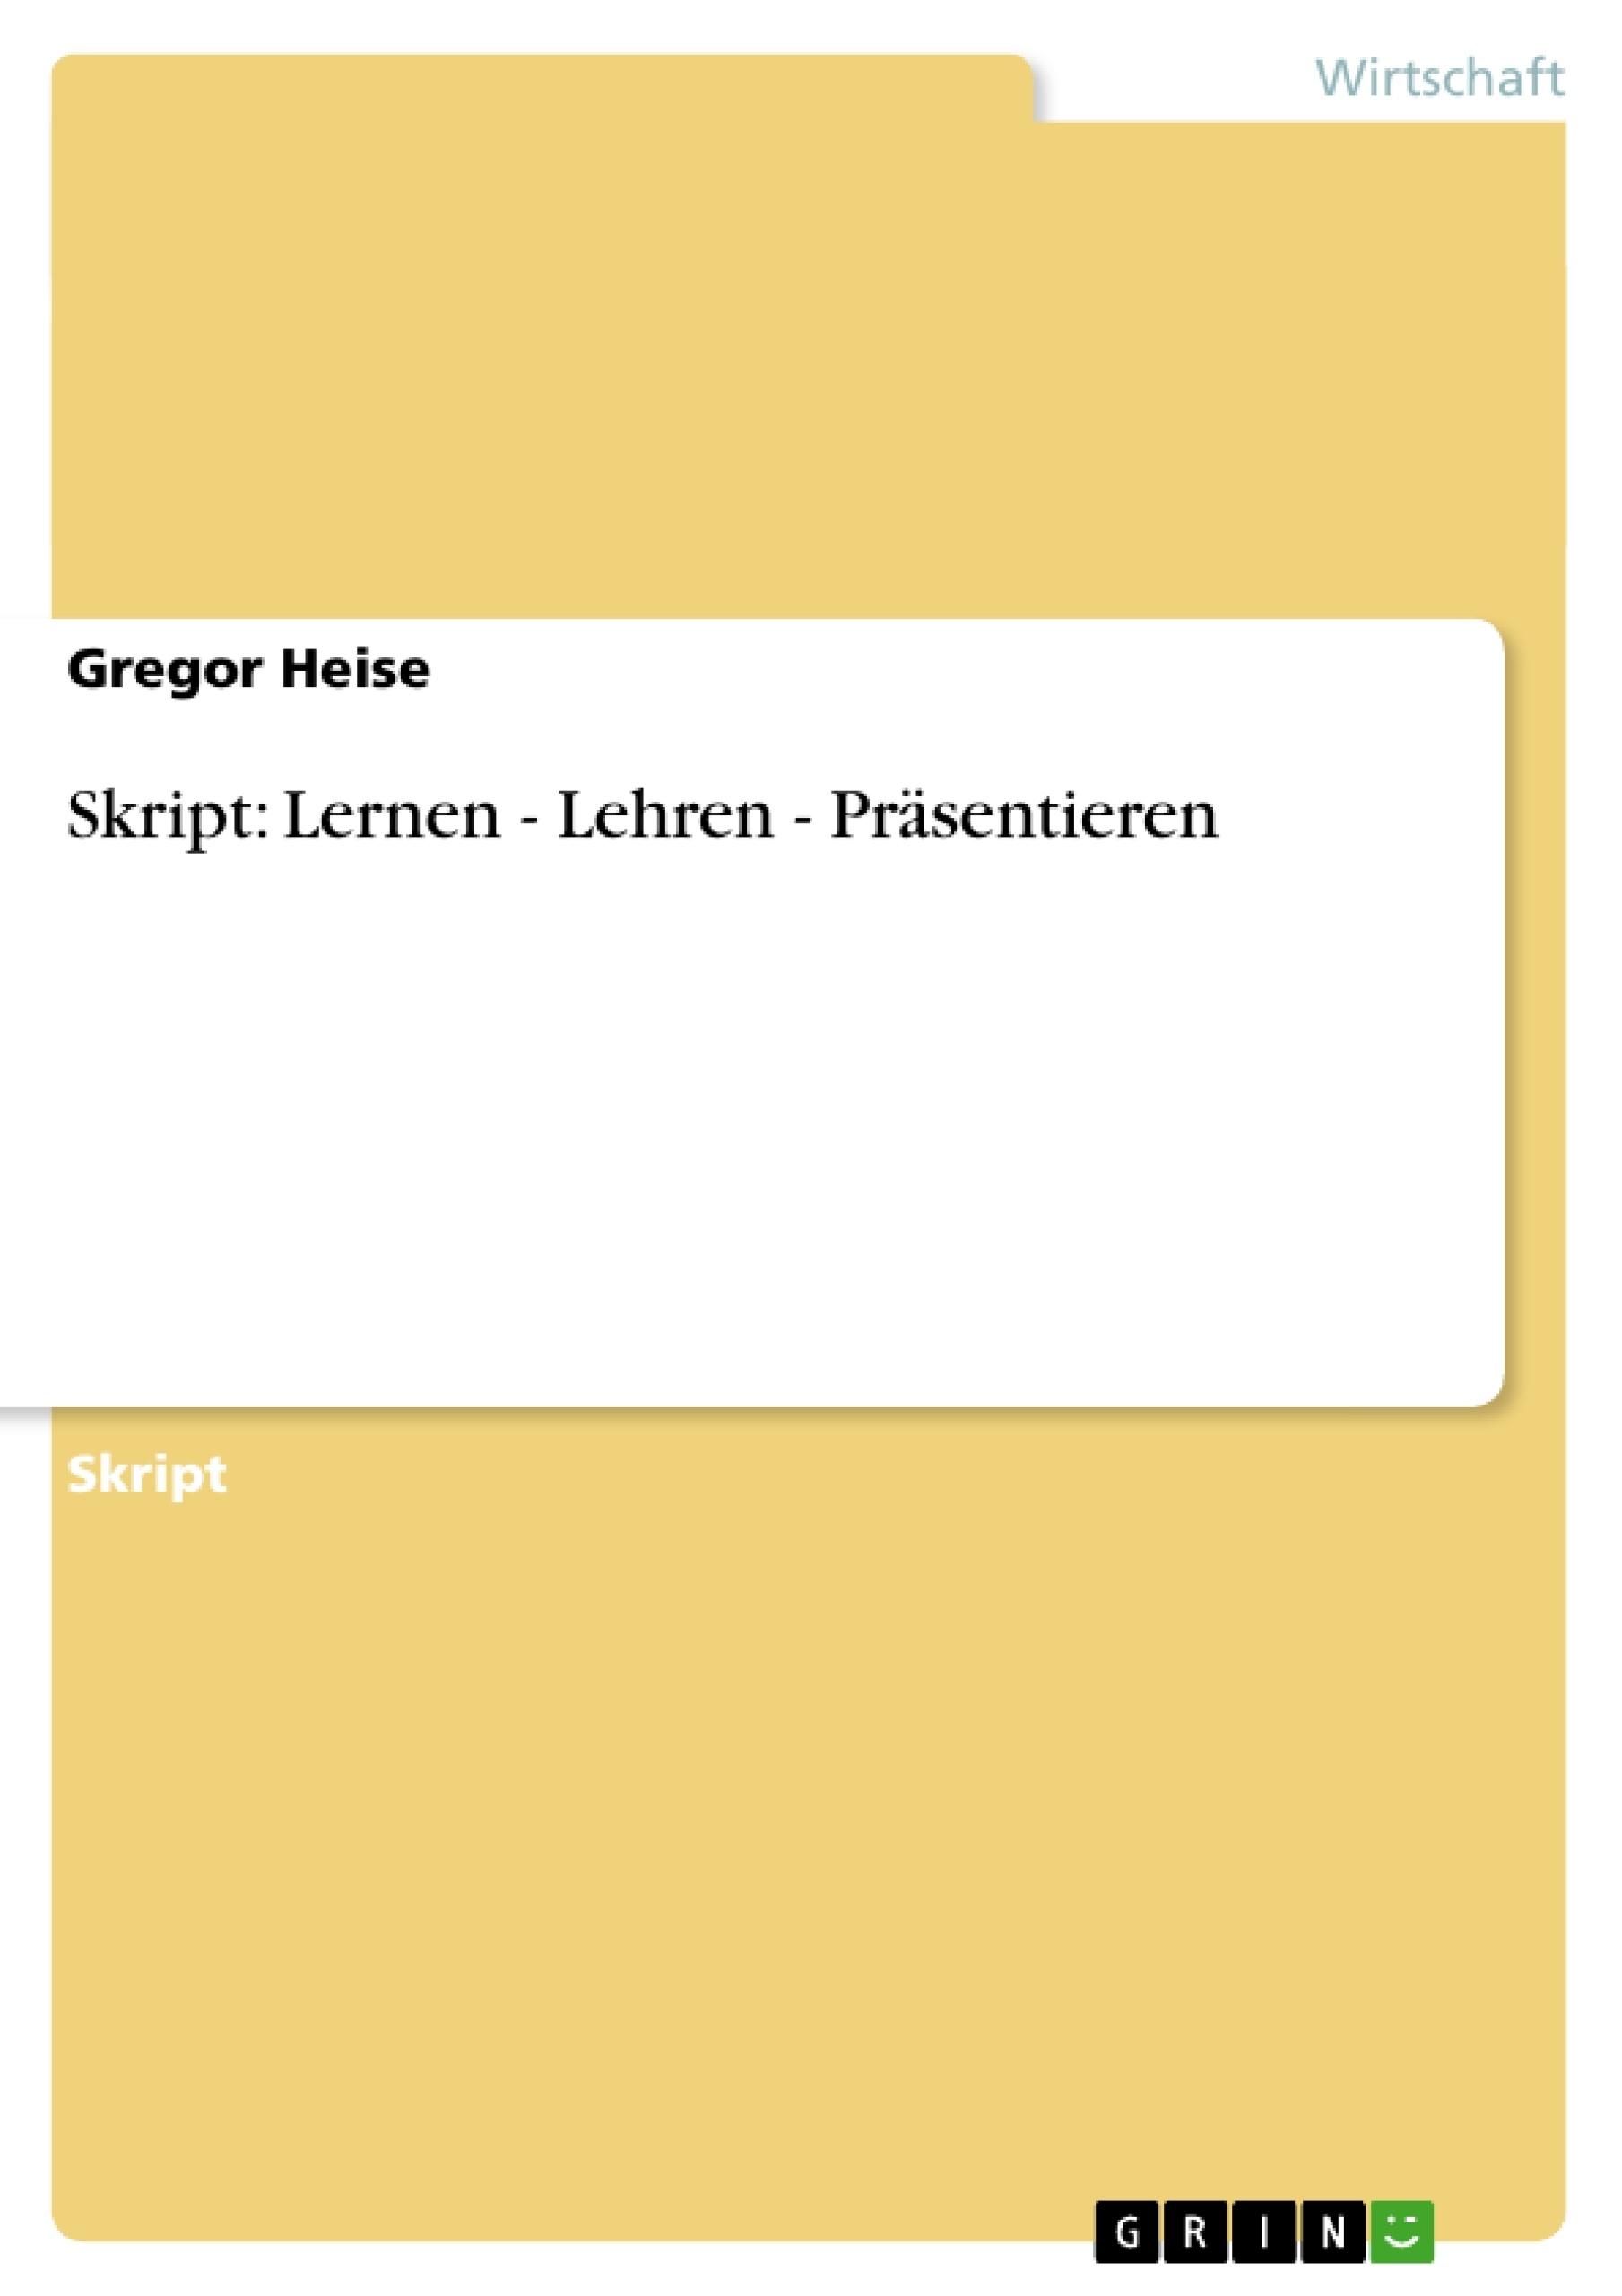 Titel: Skript: Lernen - Lehren - Präsentieren